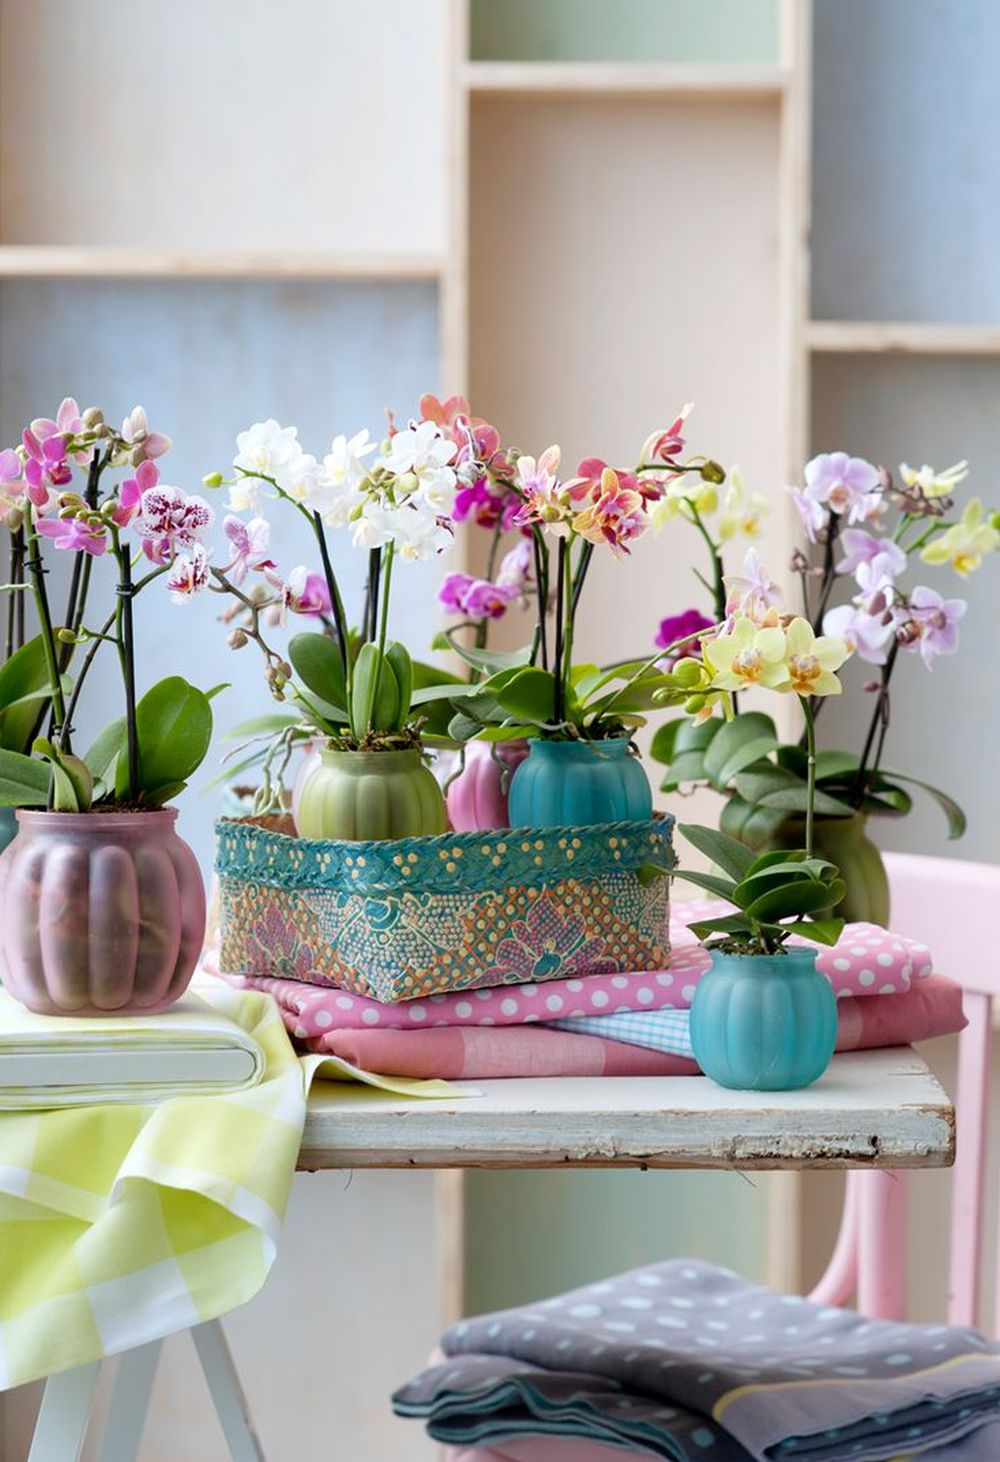 adelaparvu.com despre plante potrivite in dormitor, Text Carli Marian, Foto Pinterest